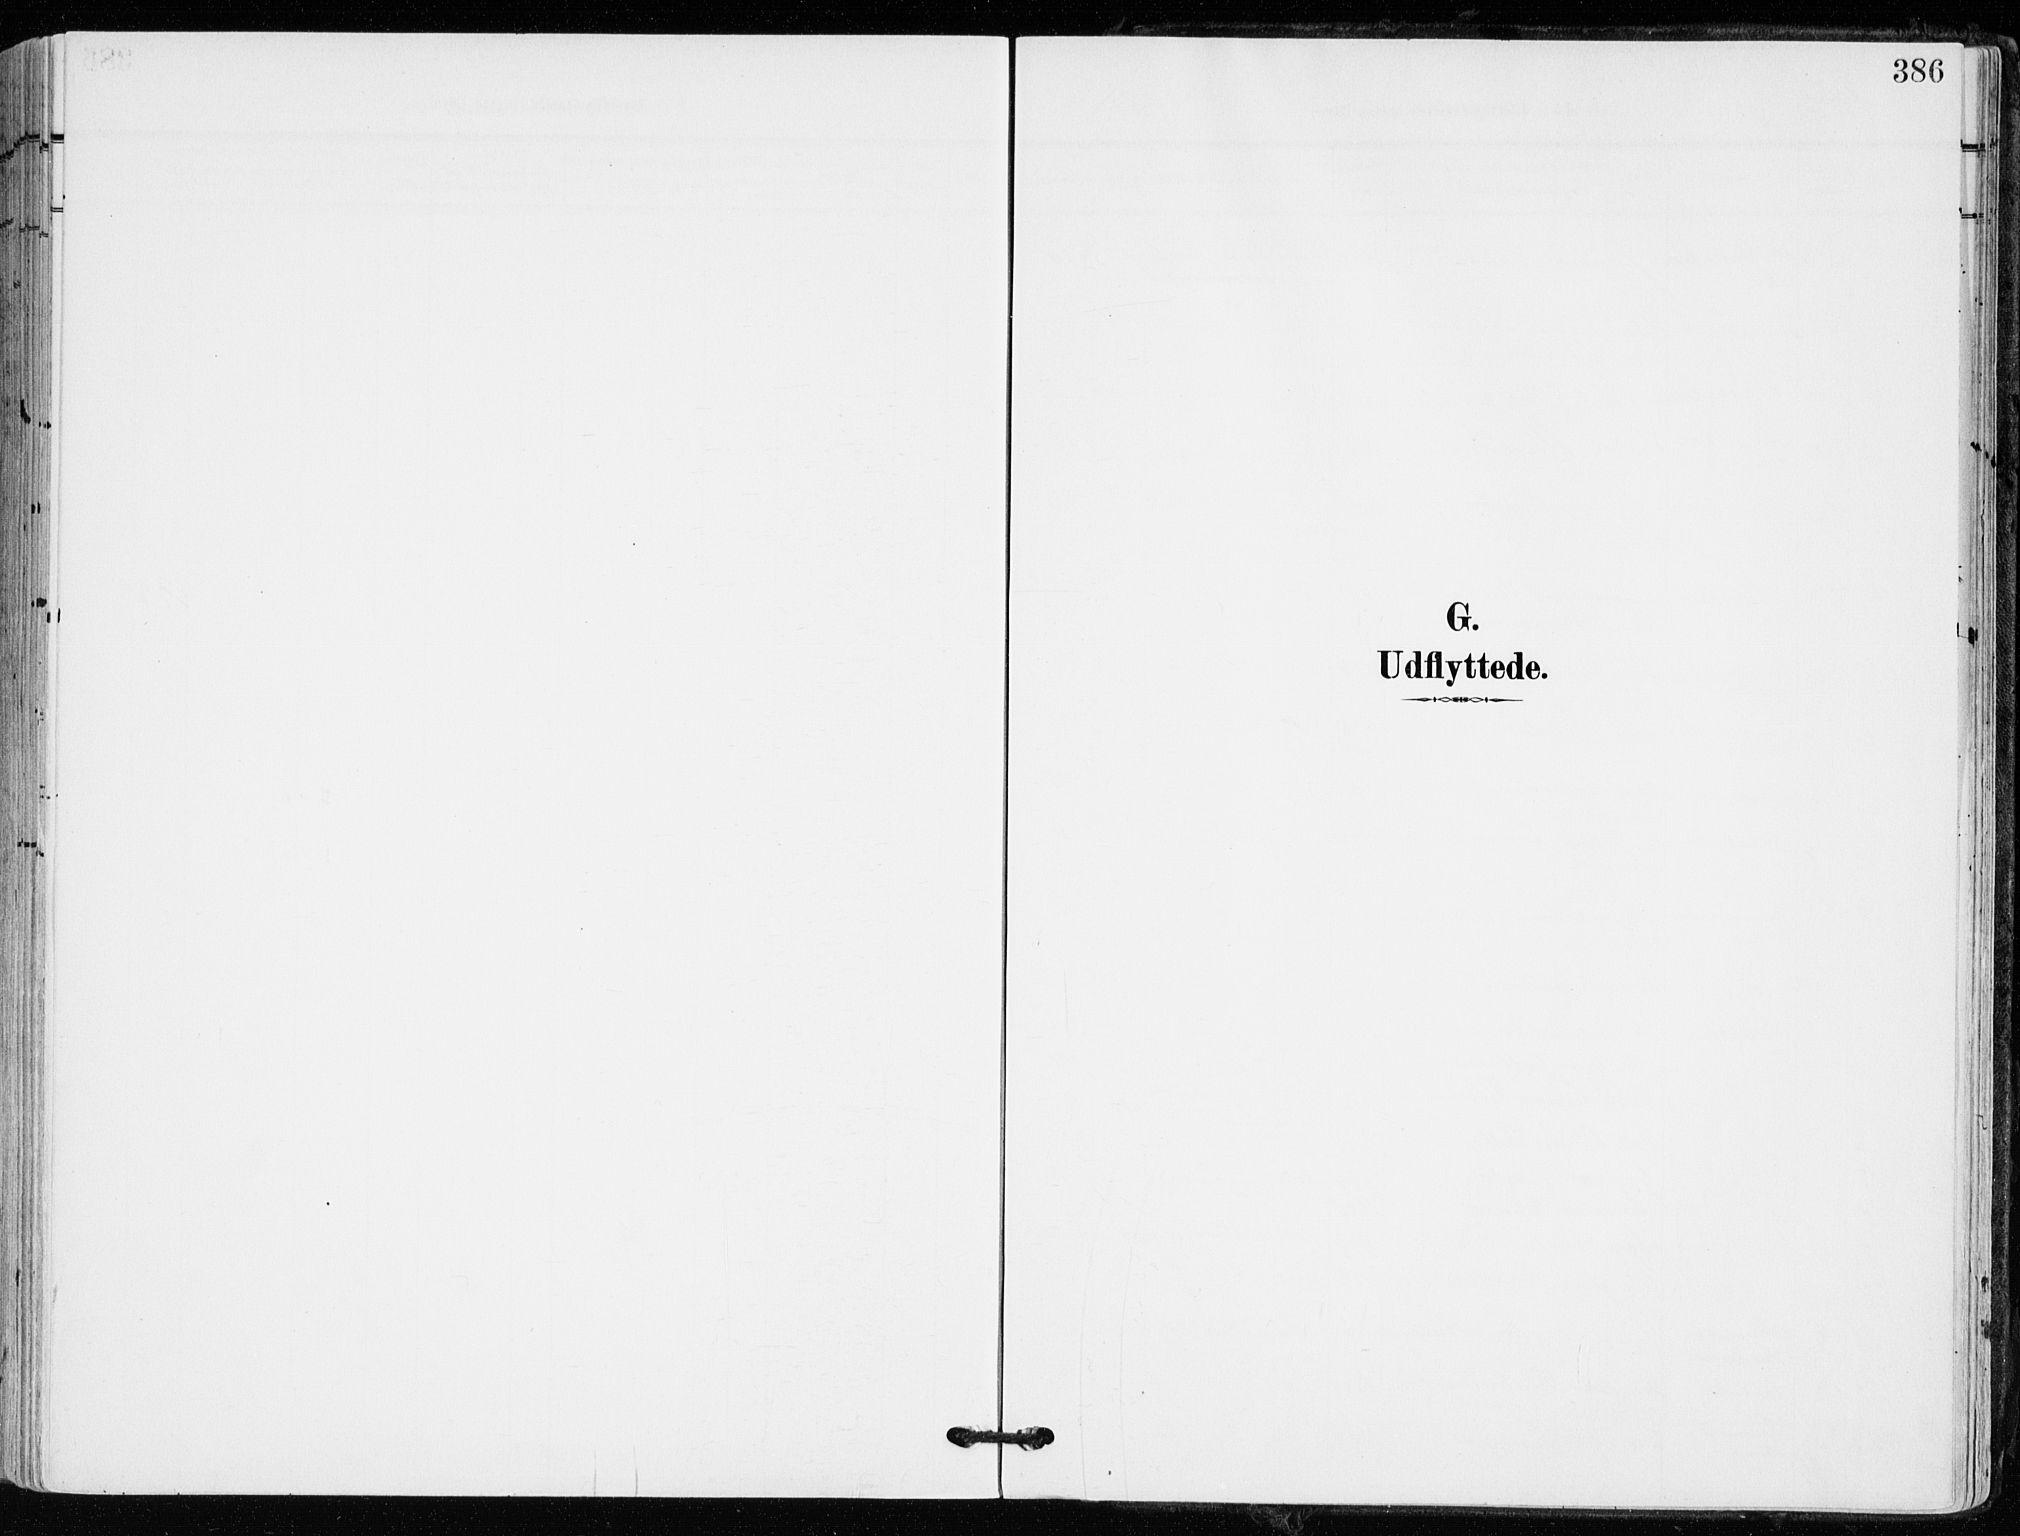 SAKO, Kongsberg kirkebøker, F/Fb/L0004: Ministerialbok nr. II 4, 1906-1918, s. 386